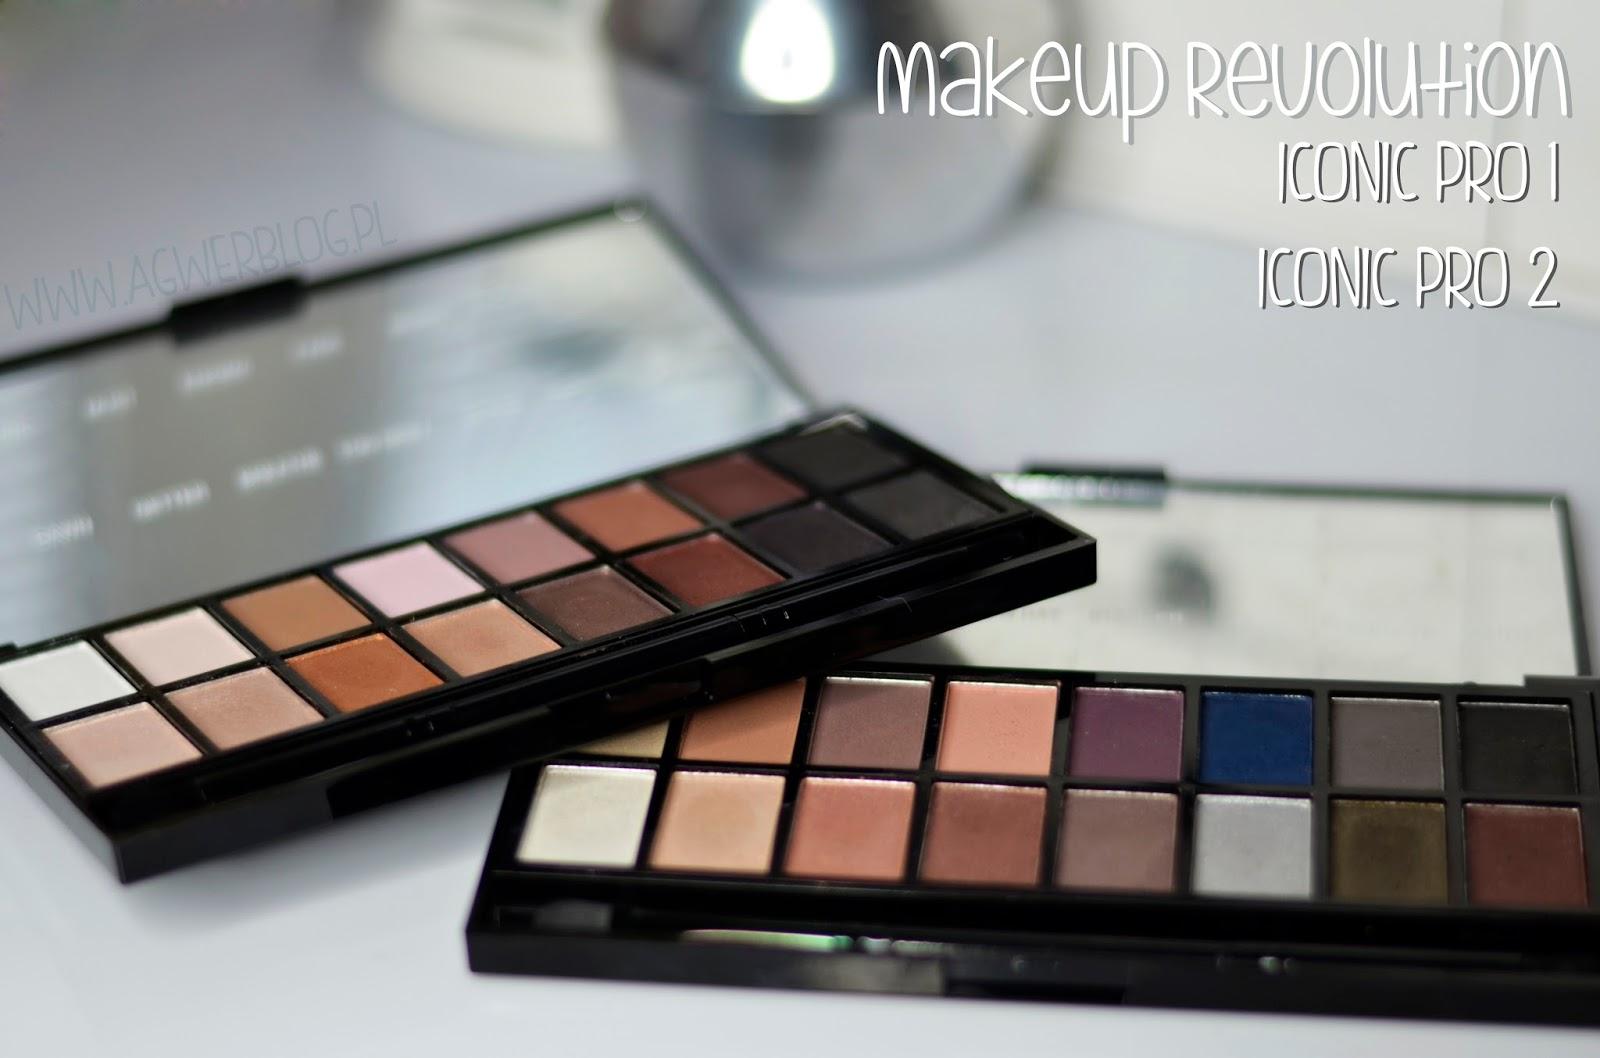 Iconic-pro-makeup-revolution